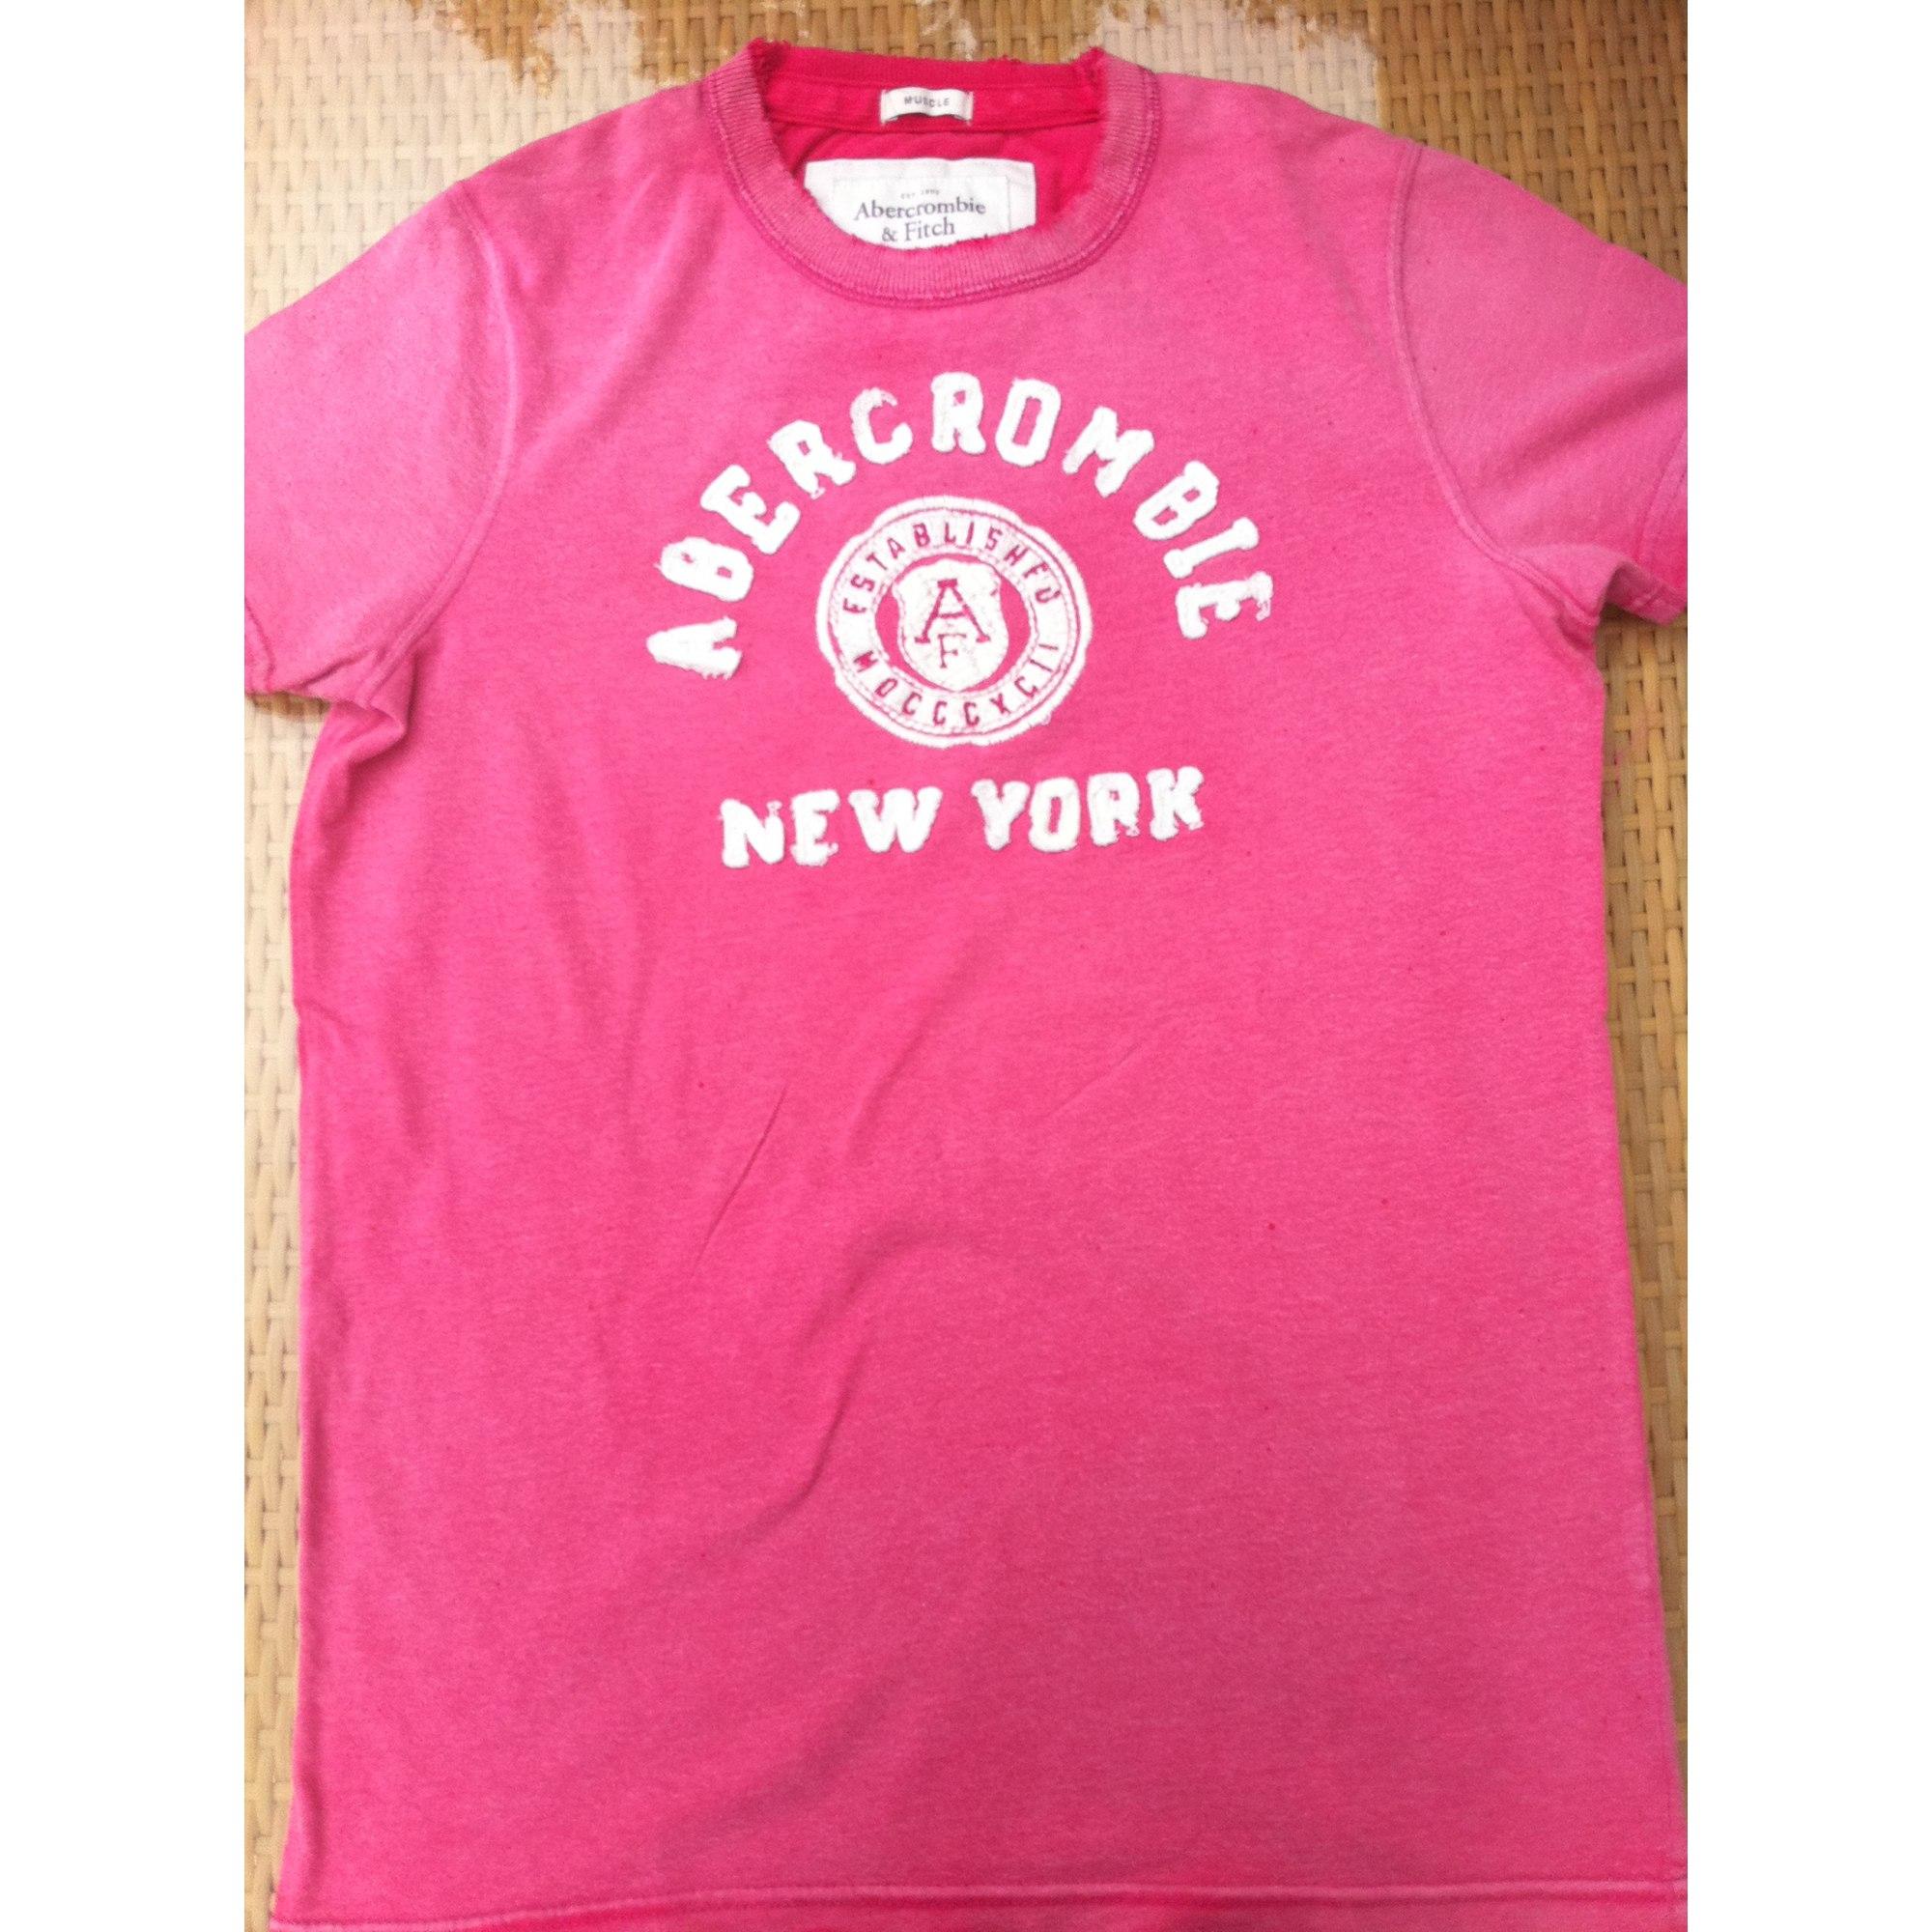 Tee-shirt ABERCROMBIE & FITCH Rose, fuschia, vieux rose